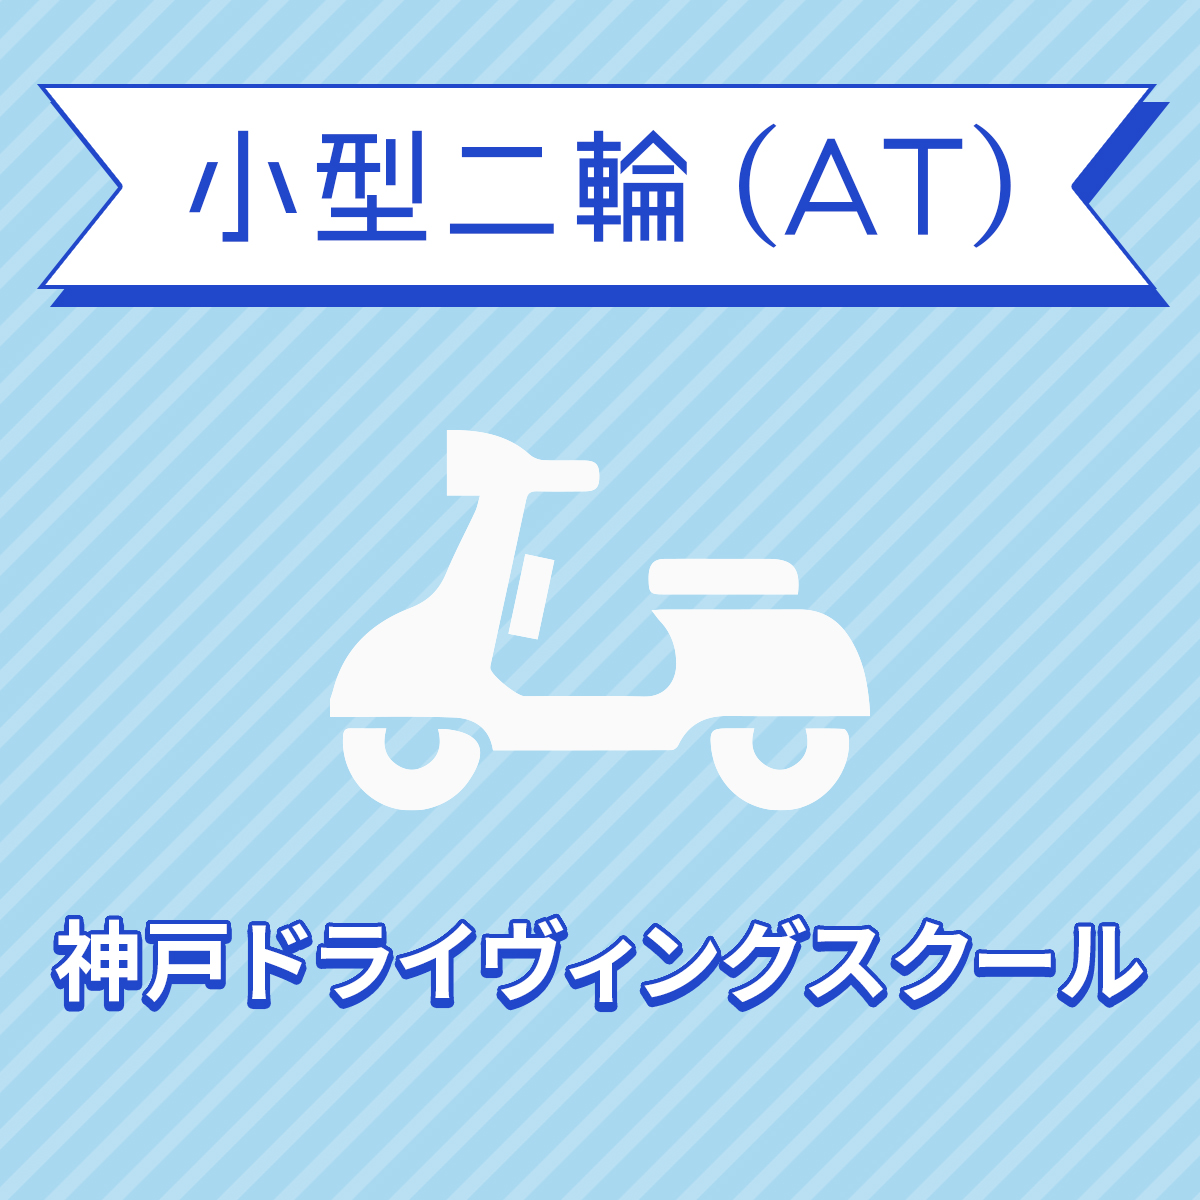 【兵庫県神戸市】小型二輪ATコース(一般料金)<免許なし/原付免許所持対象>